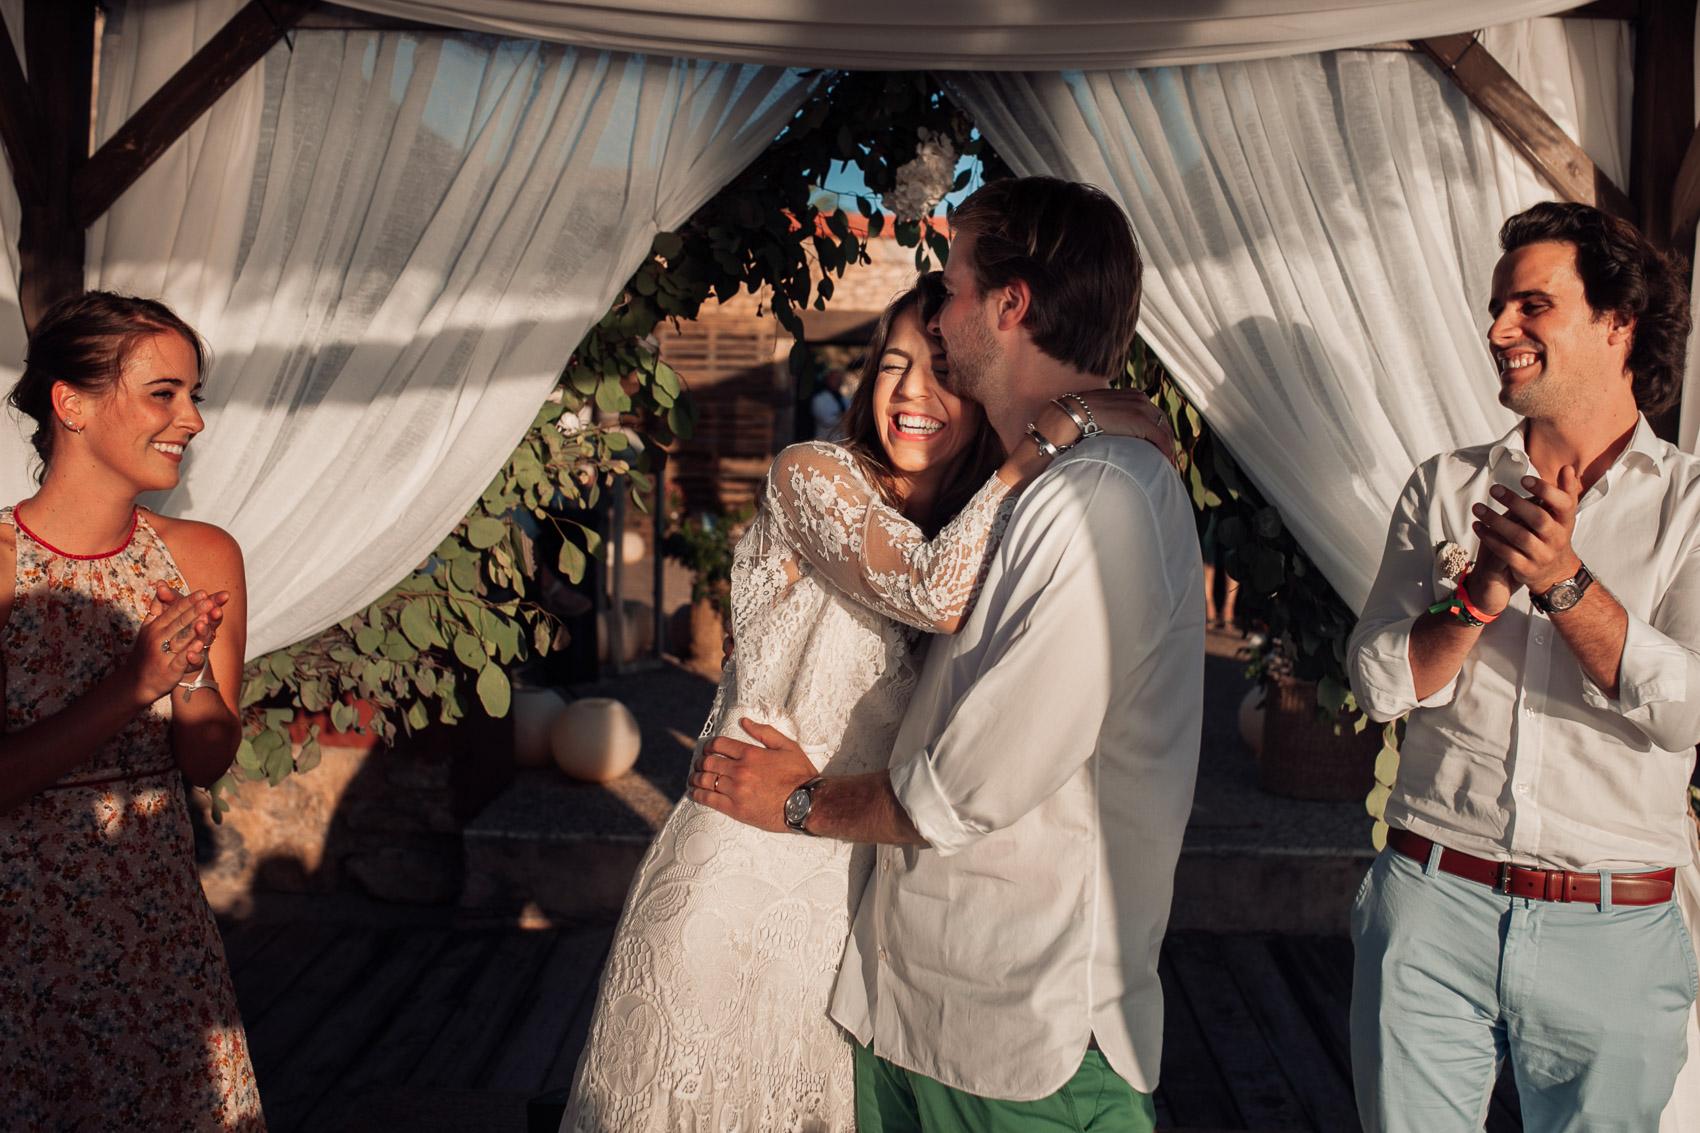 abrazo pareja novios wedding invitados aplauso